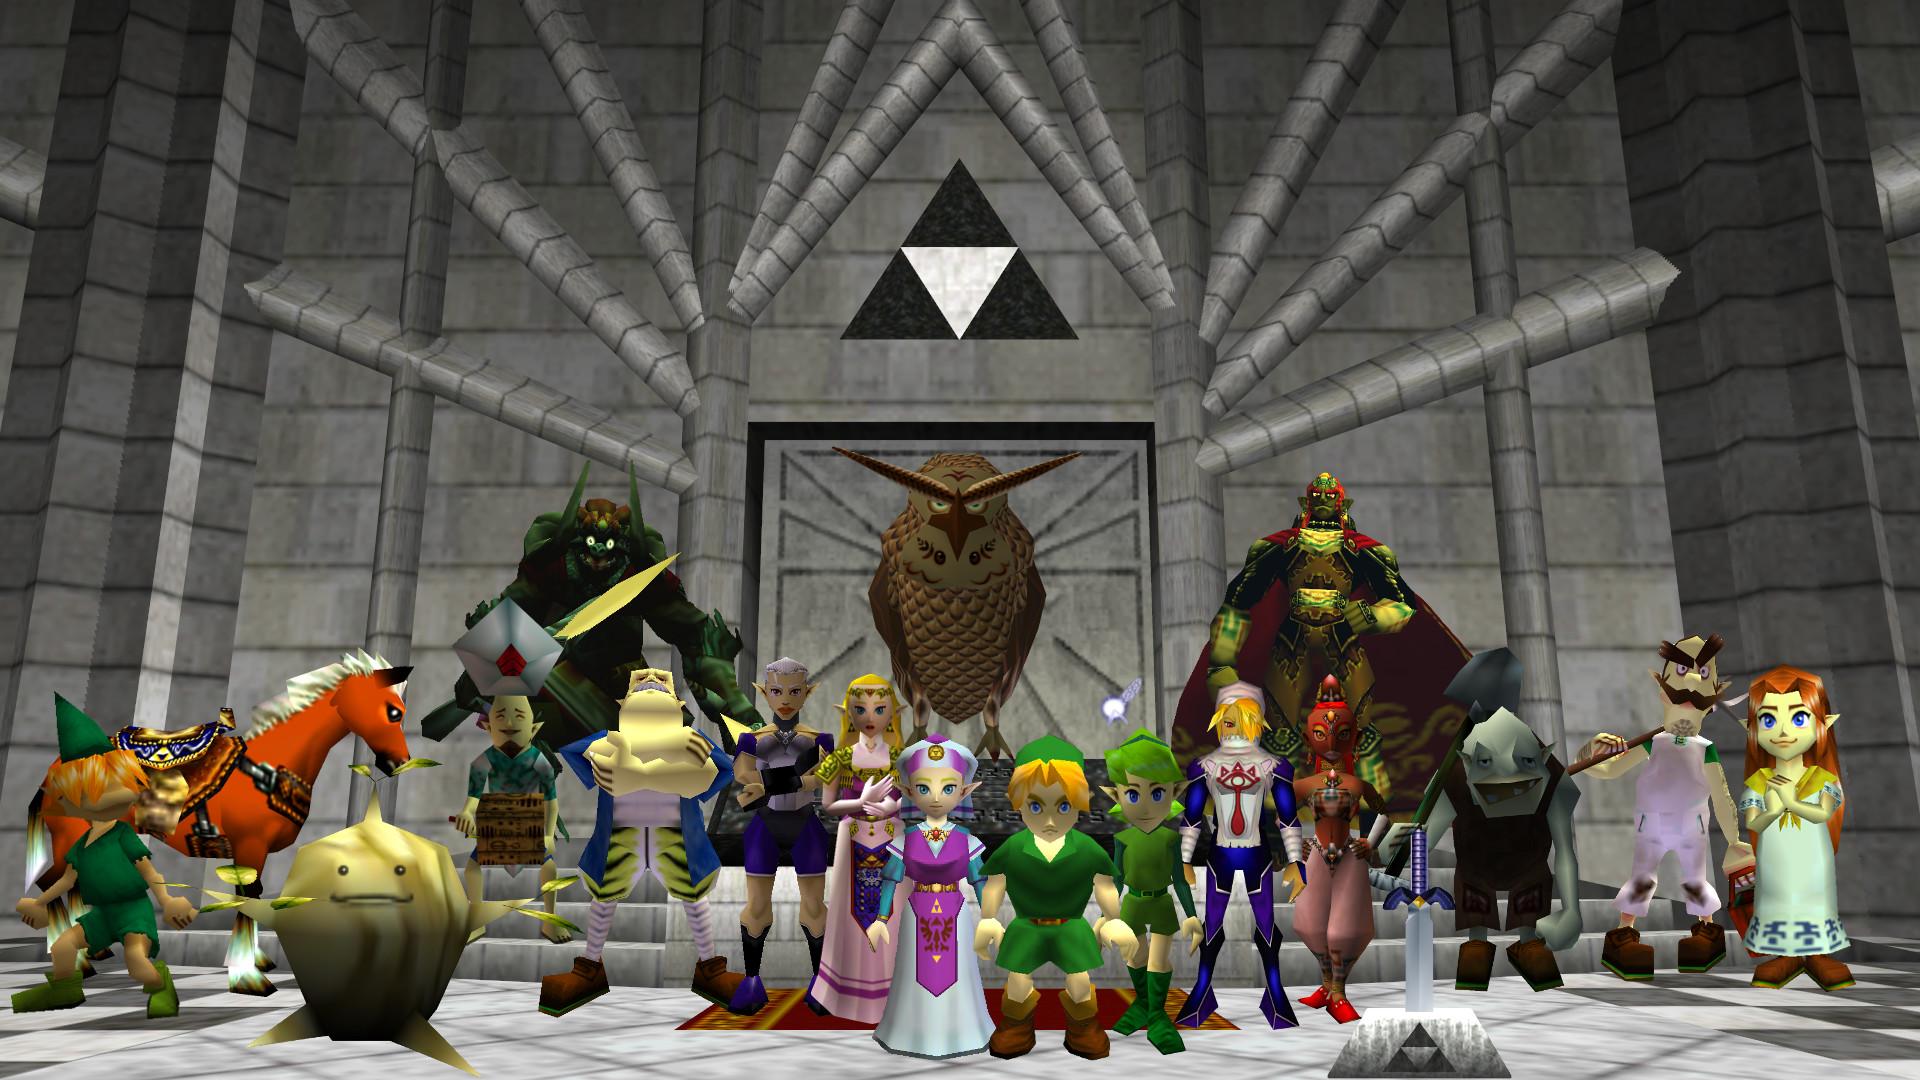 The Legend of Zelda: Ocarina of Time images Ocarina of Time Wallpaper HD  wallpaper and background photos